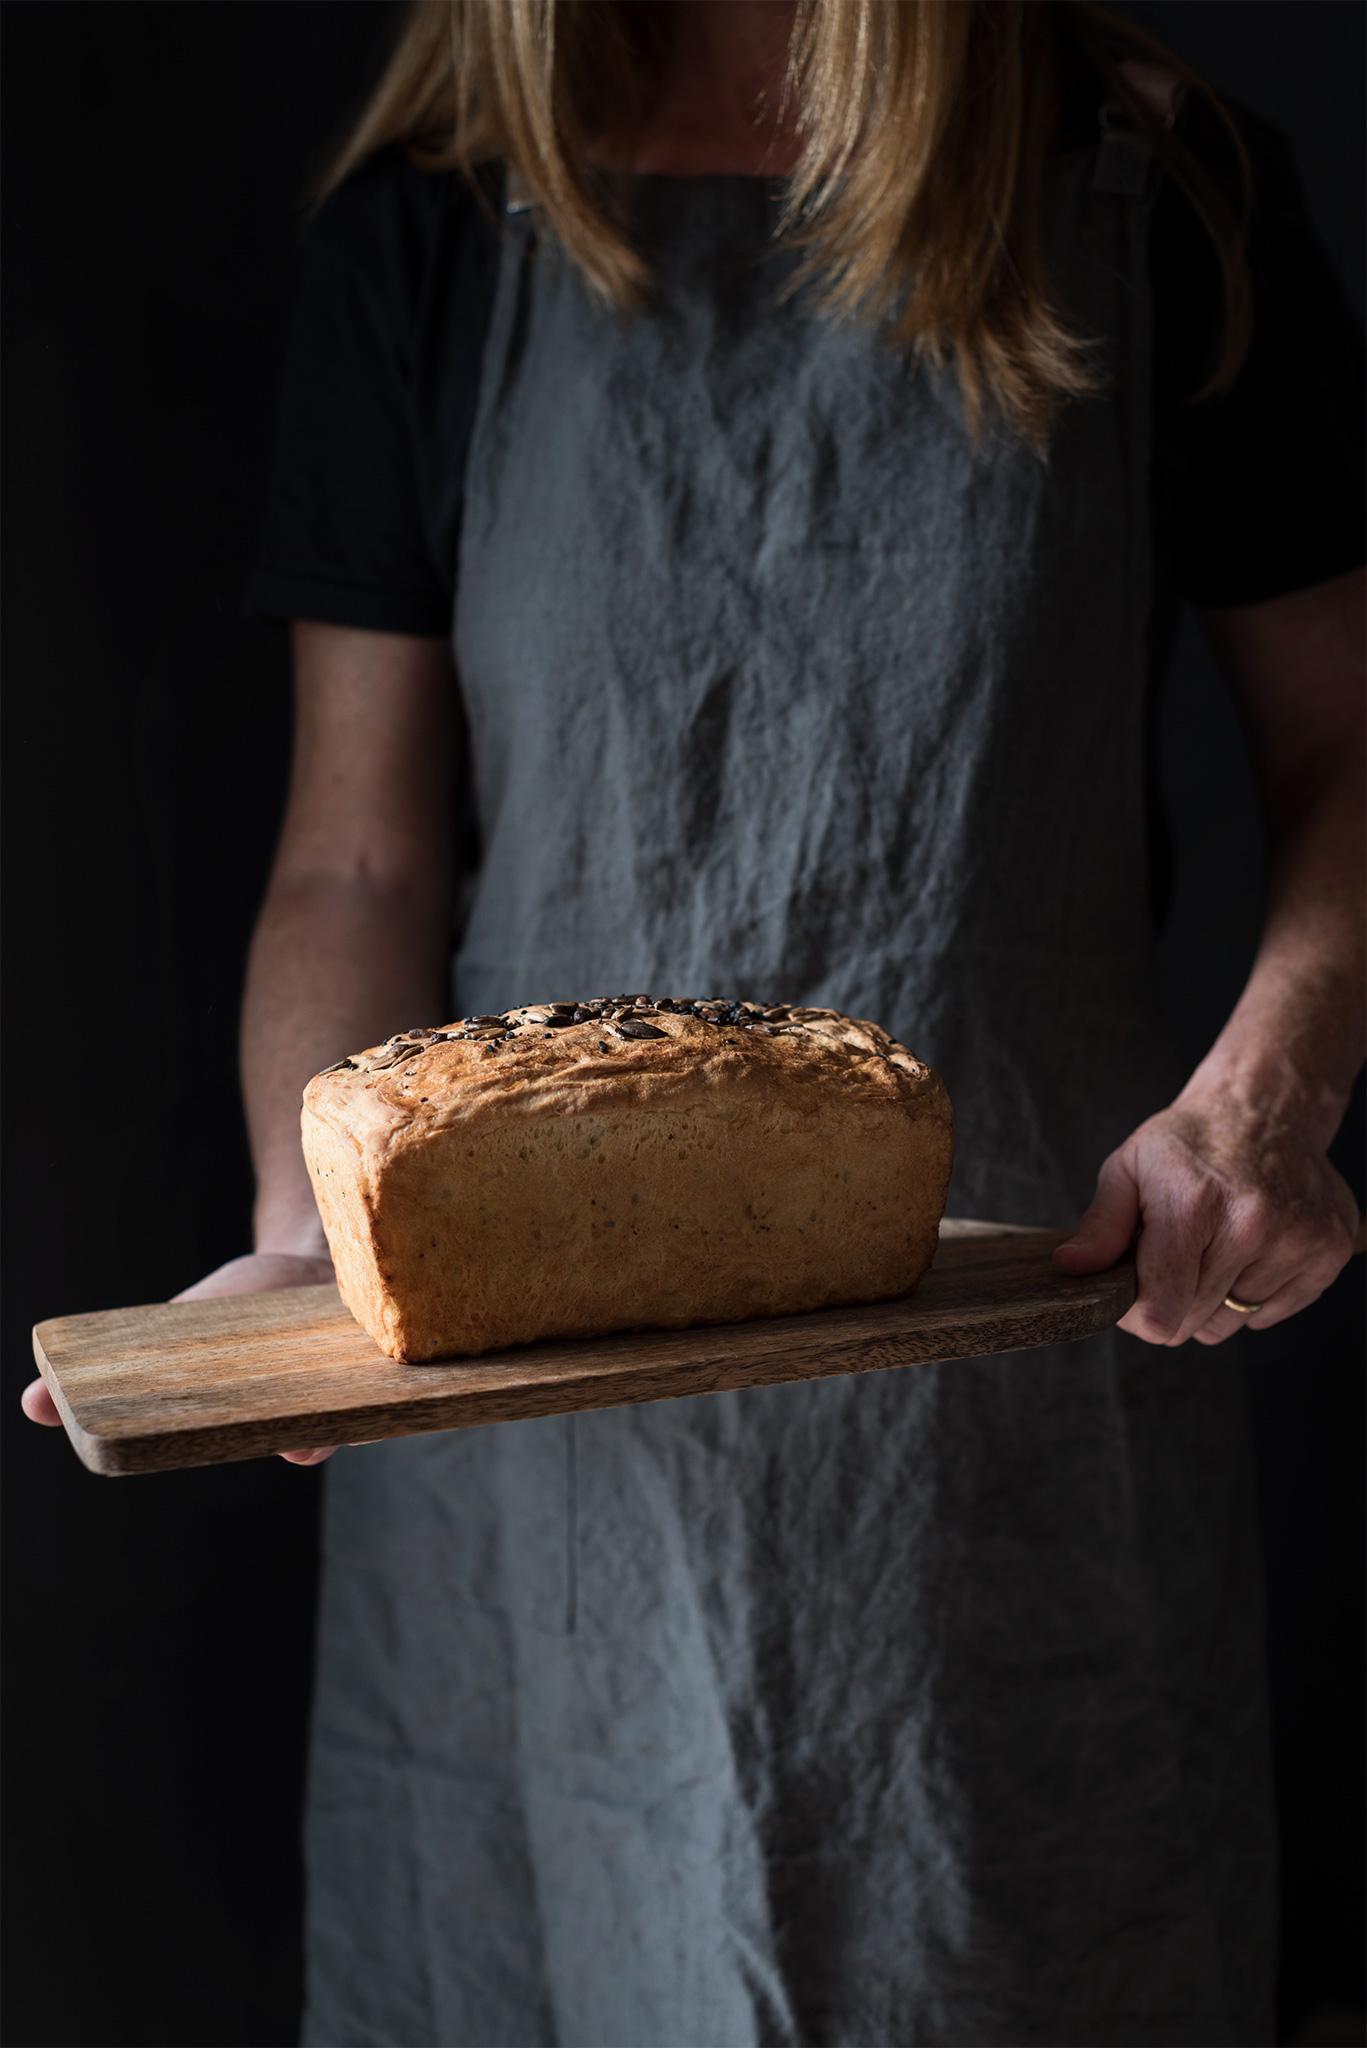 Pan de molde casero recien horneado